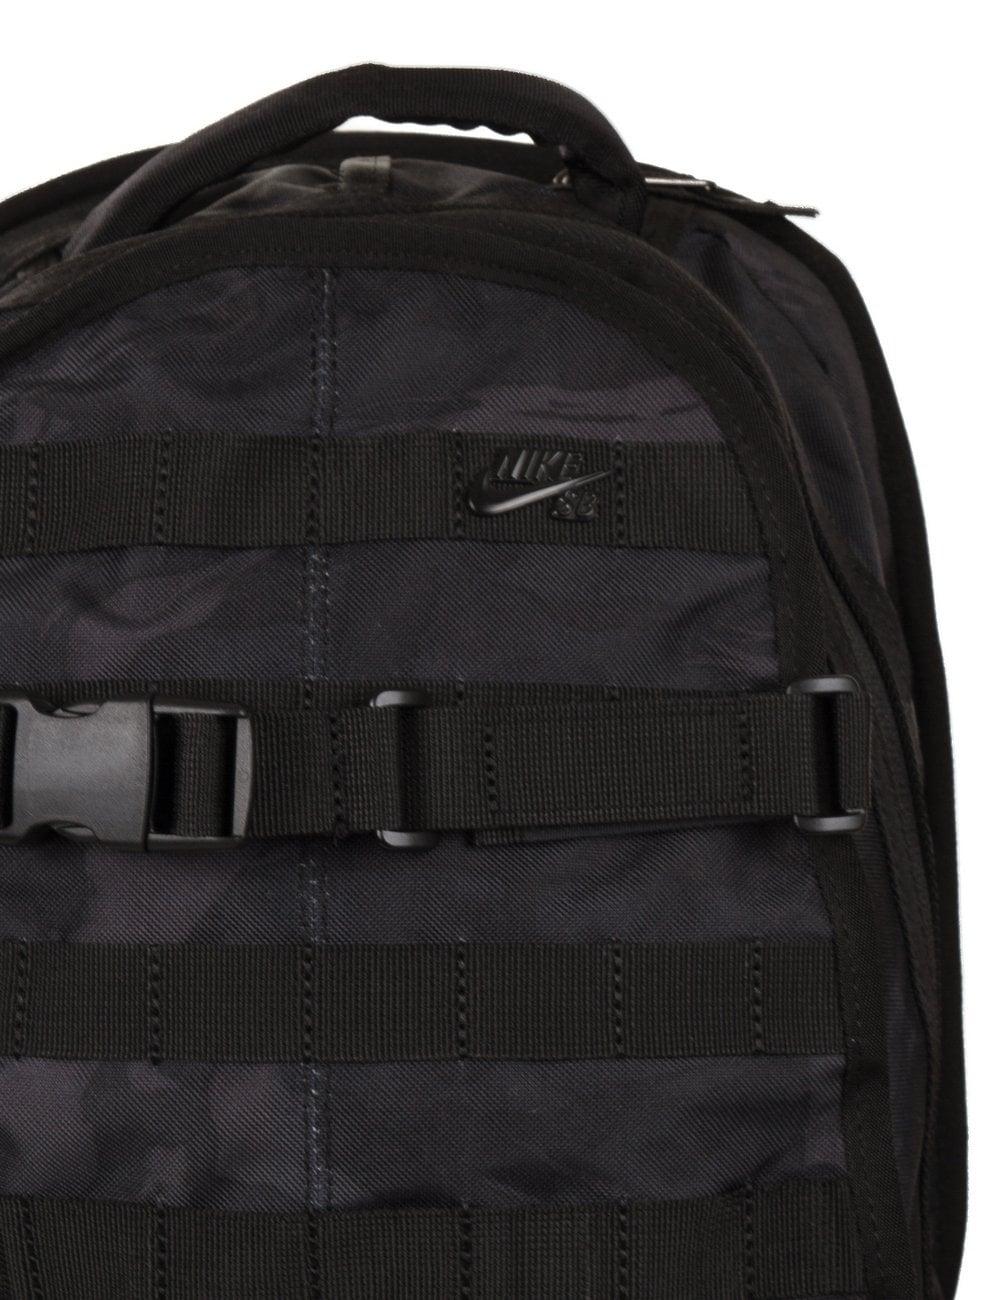 c8caeb04d80e nike sb rpm backpack sale